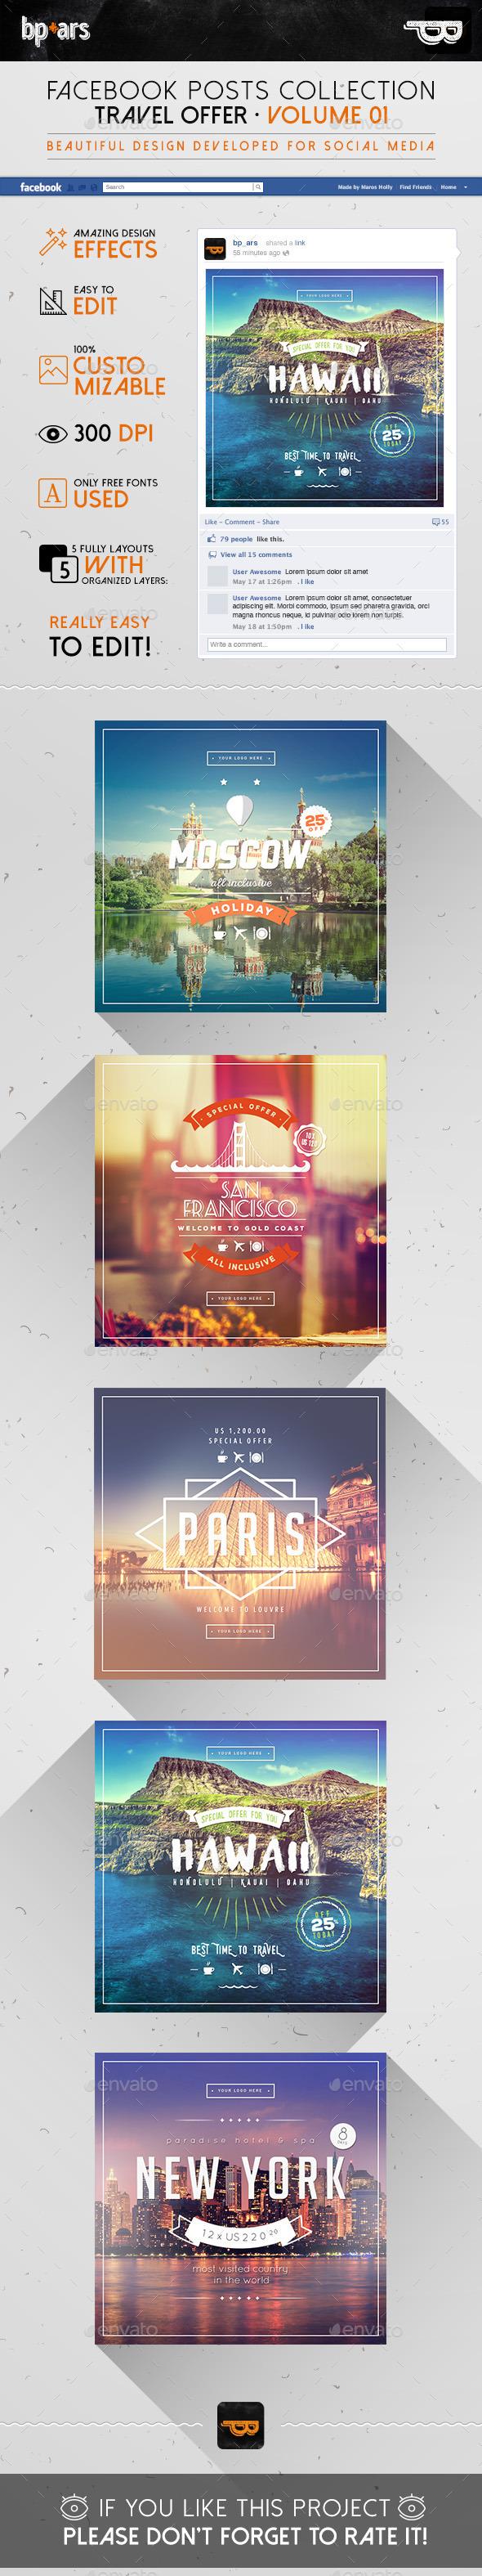 5 Facebook Banners Posts Travel Offer Vol I Facebook Banner Instagram Banner Web Banner Design